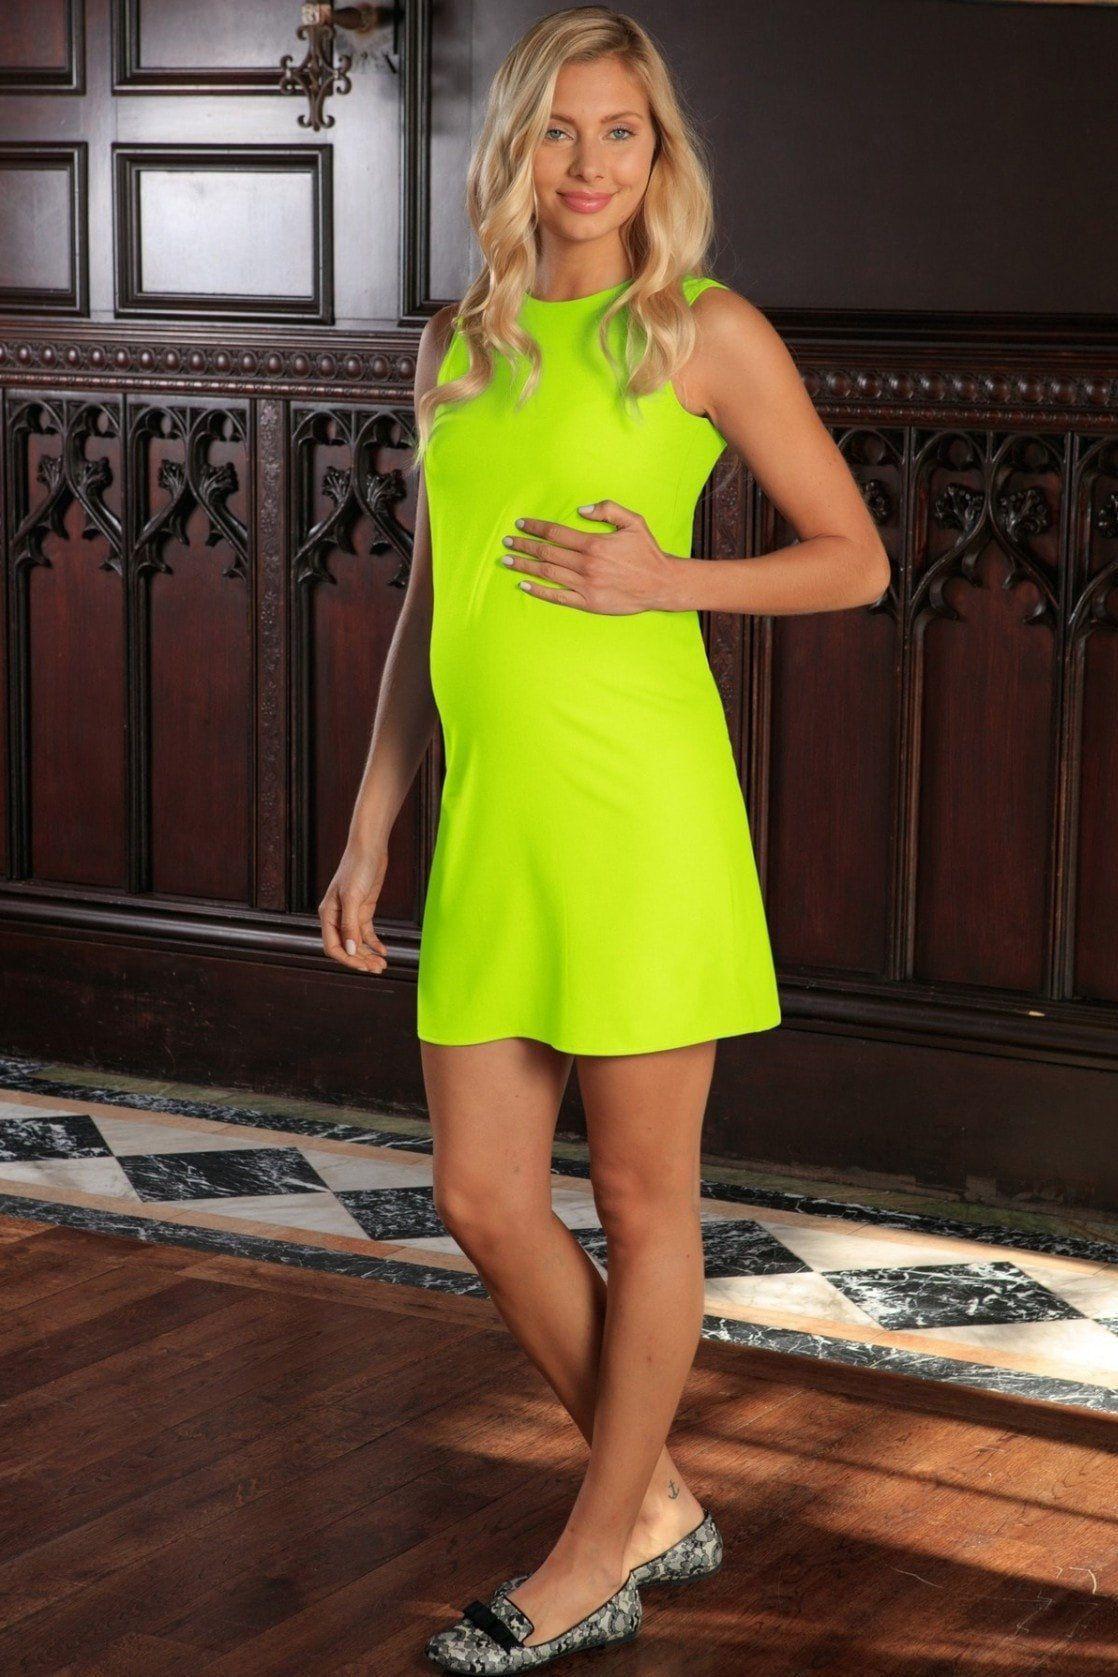 Yellow dress for women  Neon Yellow Stretchy Sleeveless Summer Shift Dress  Women Maternity